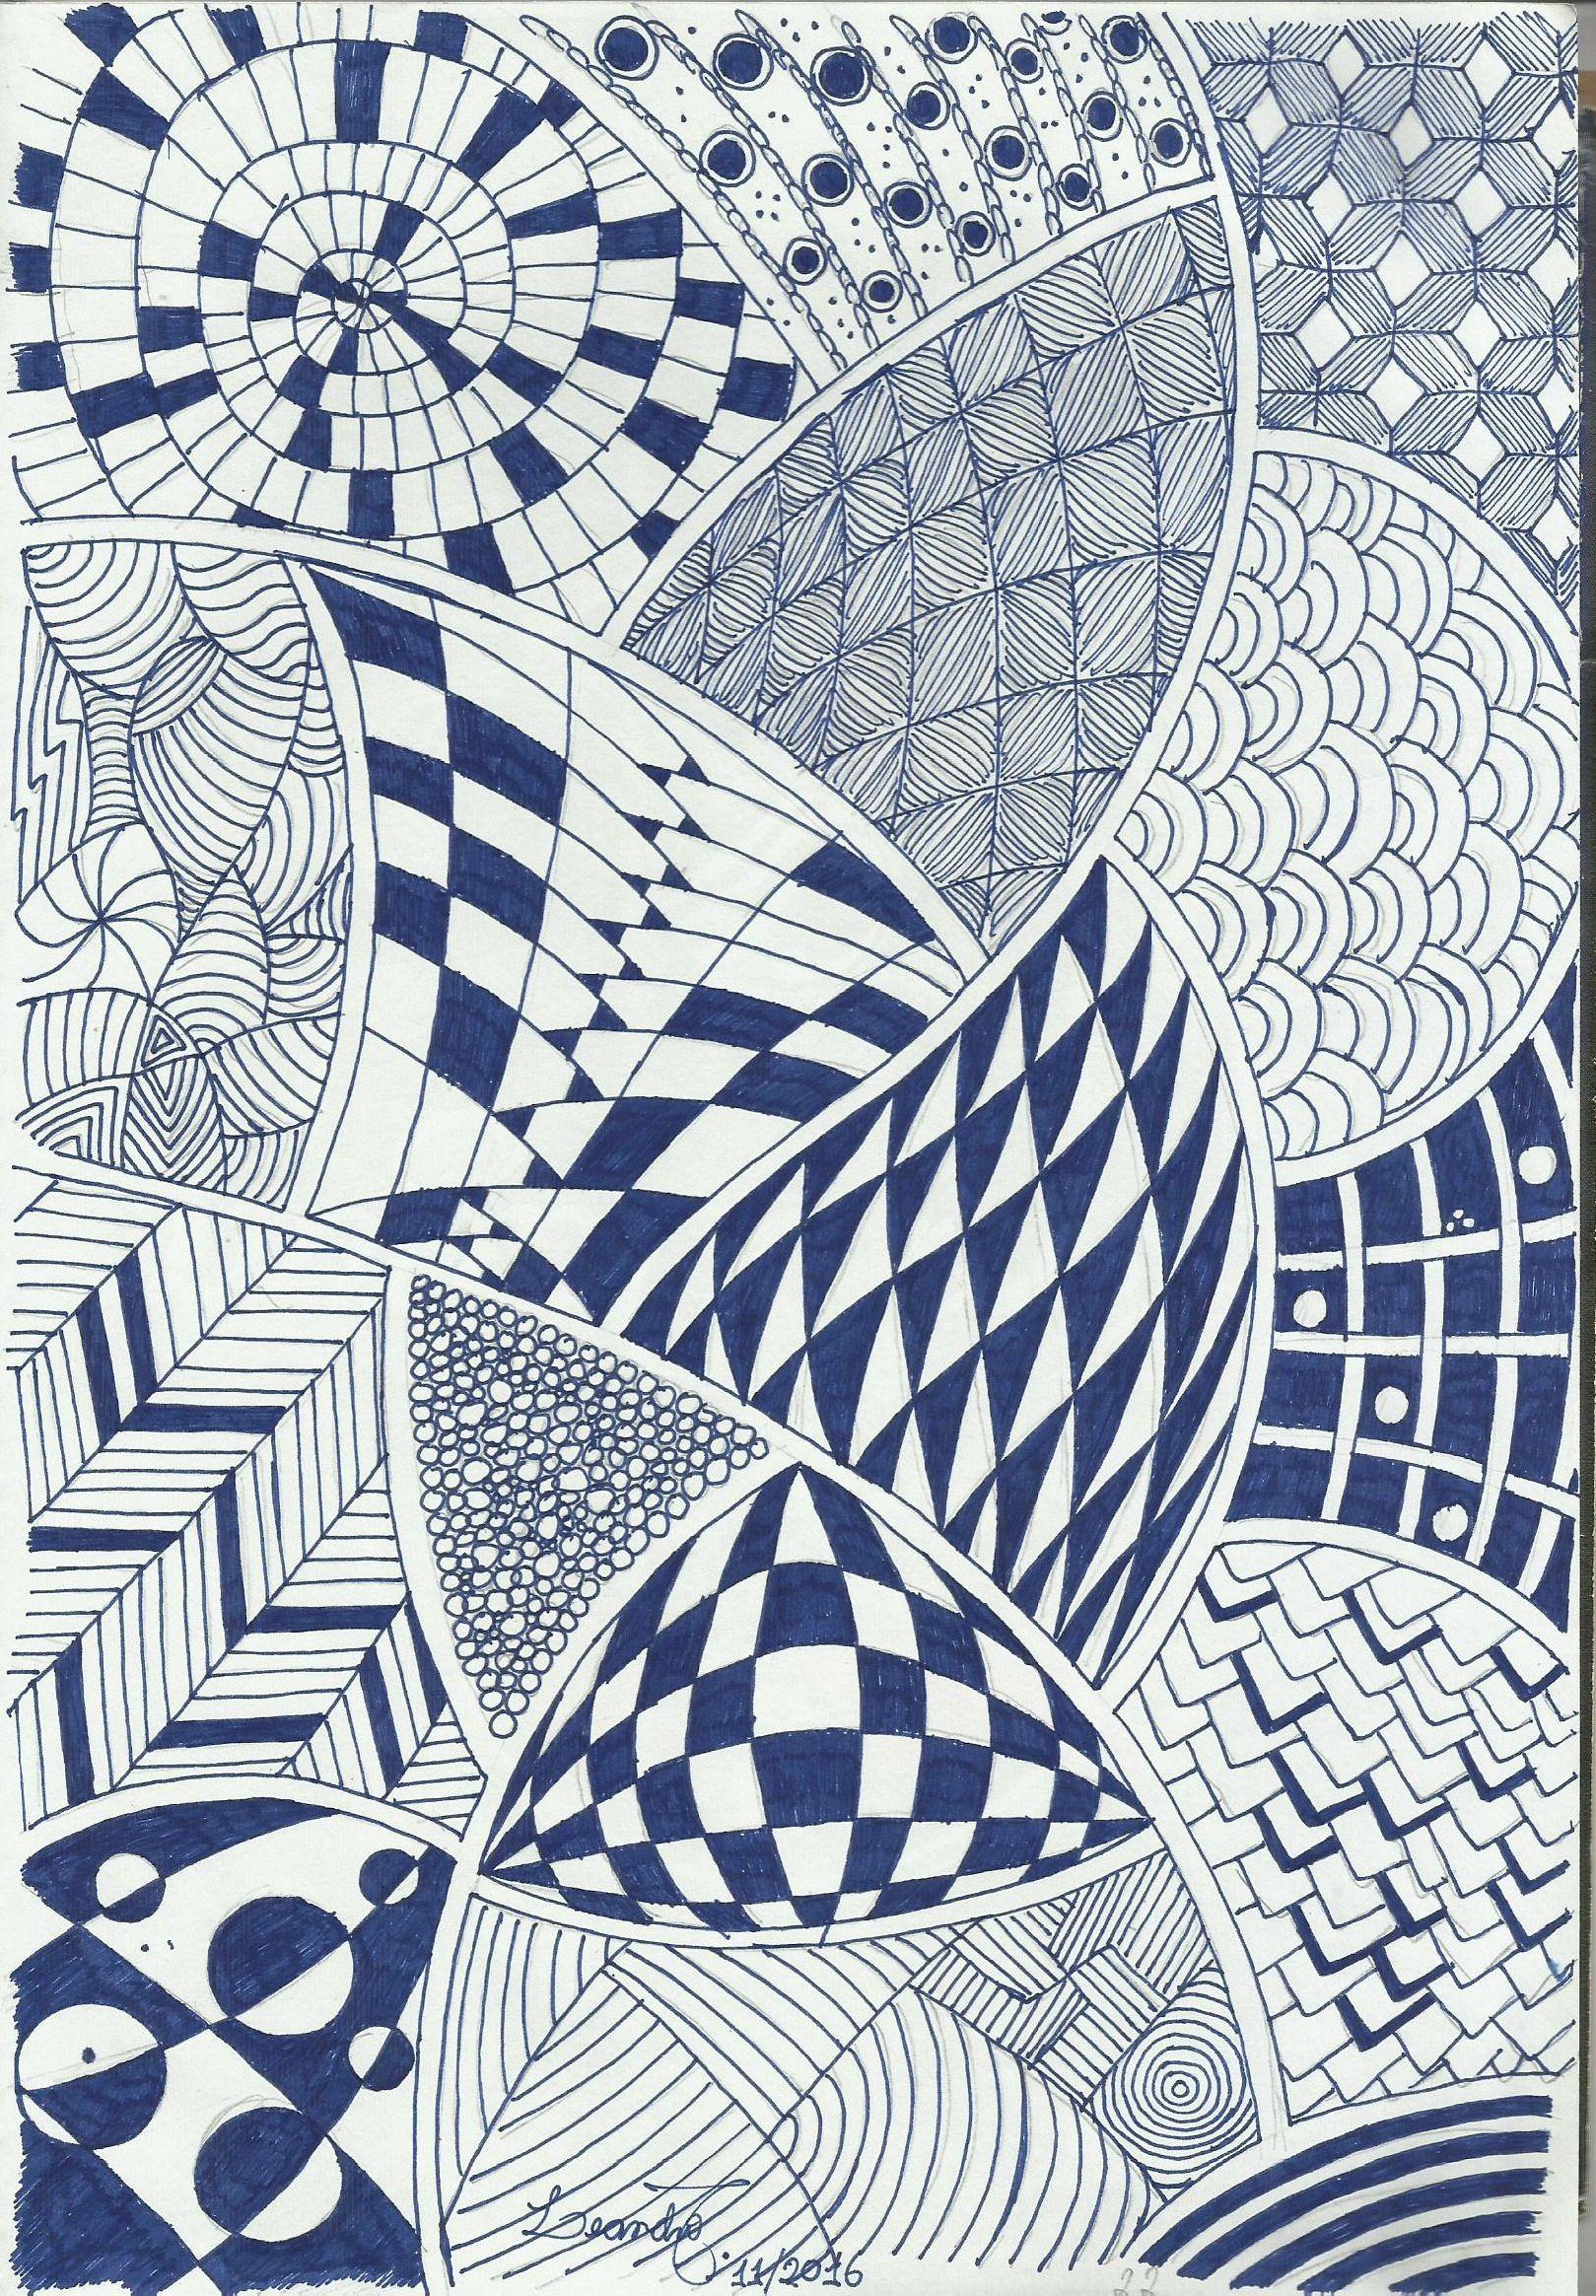 Exemplos de desenhos abstratos